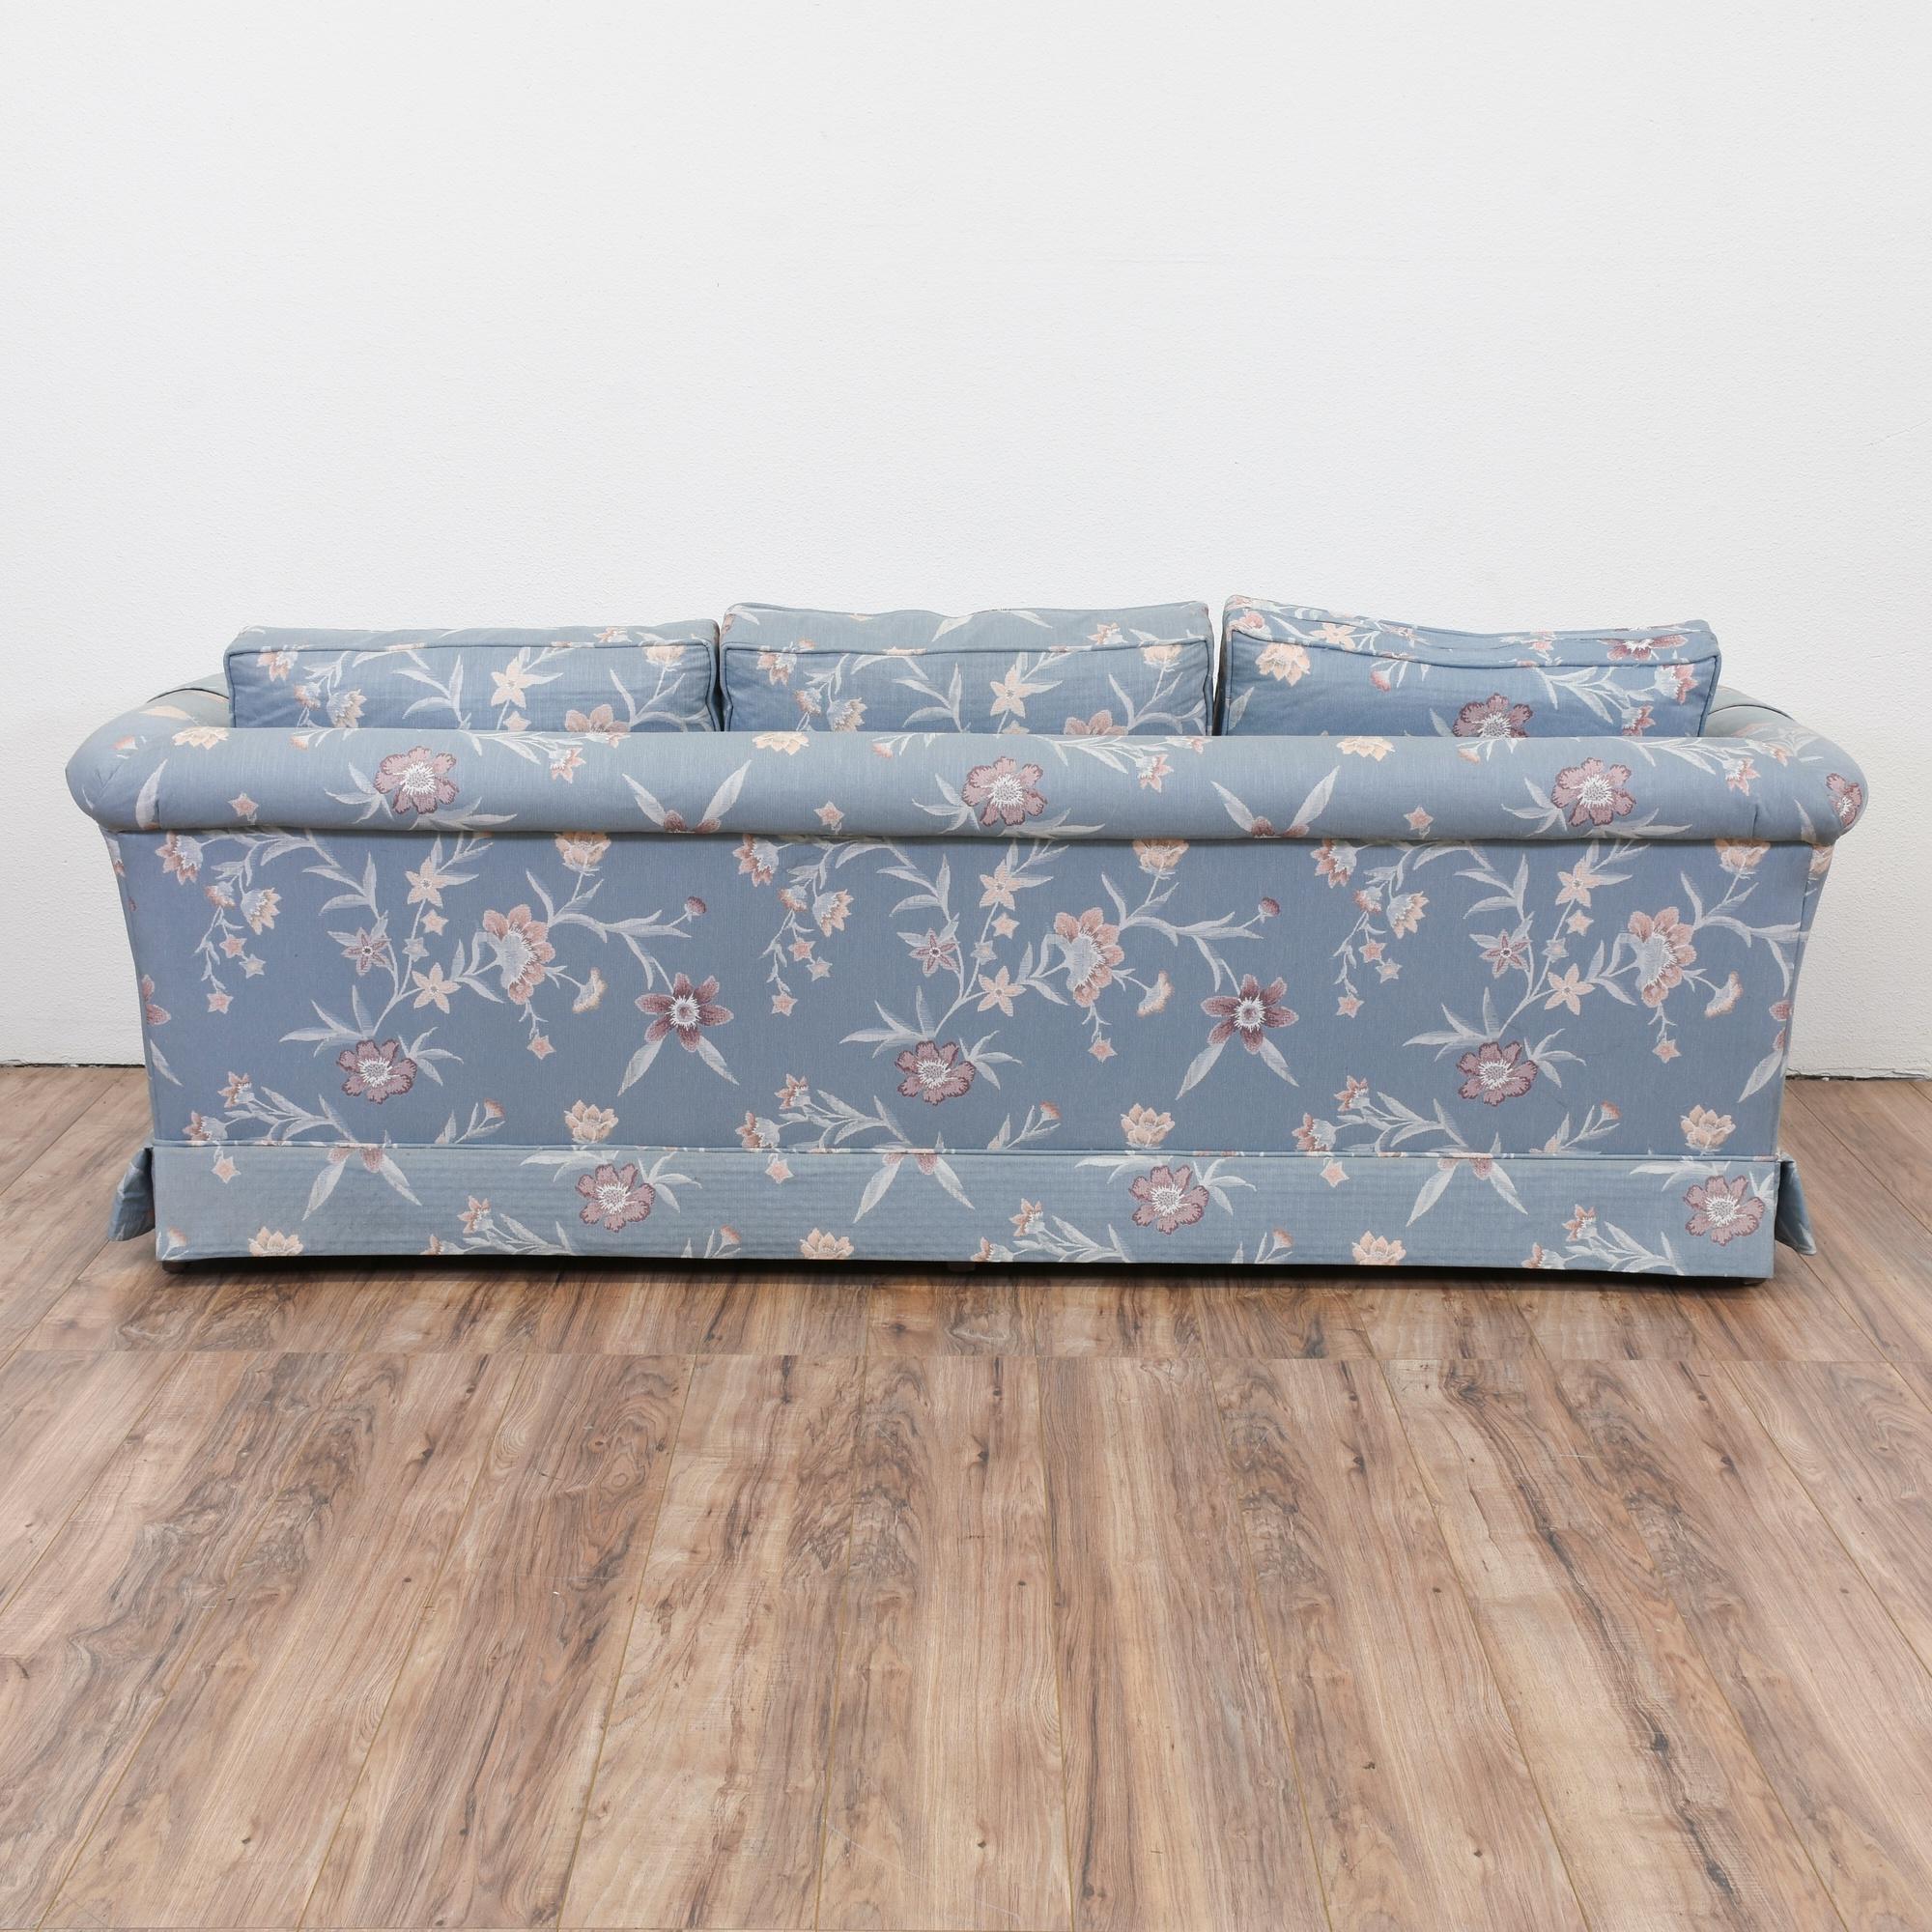 Loveseat Vintage Furniture San Diego